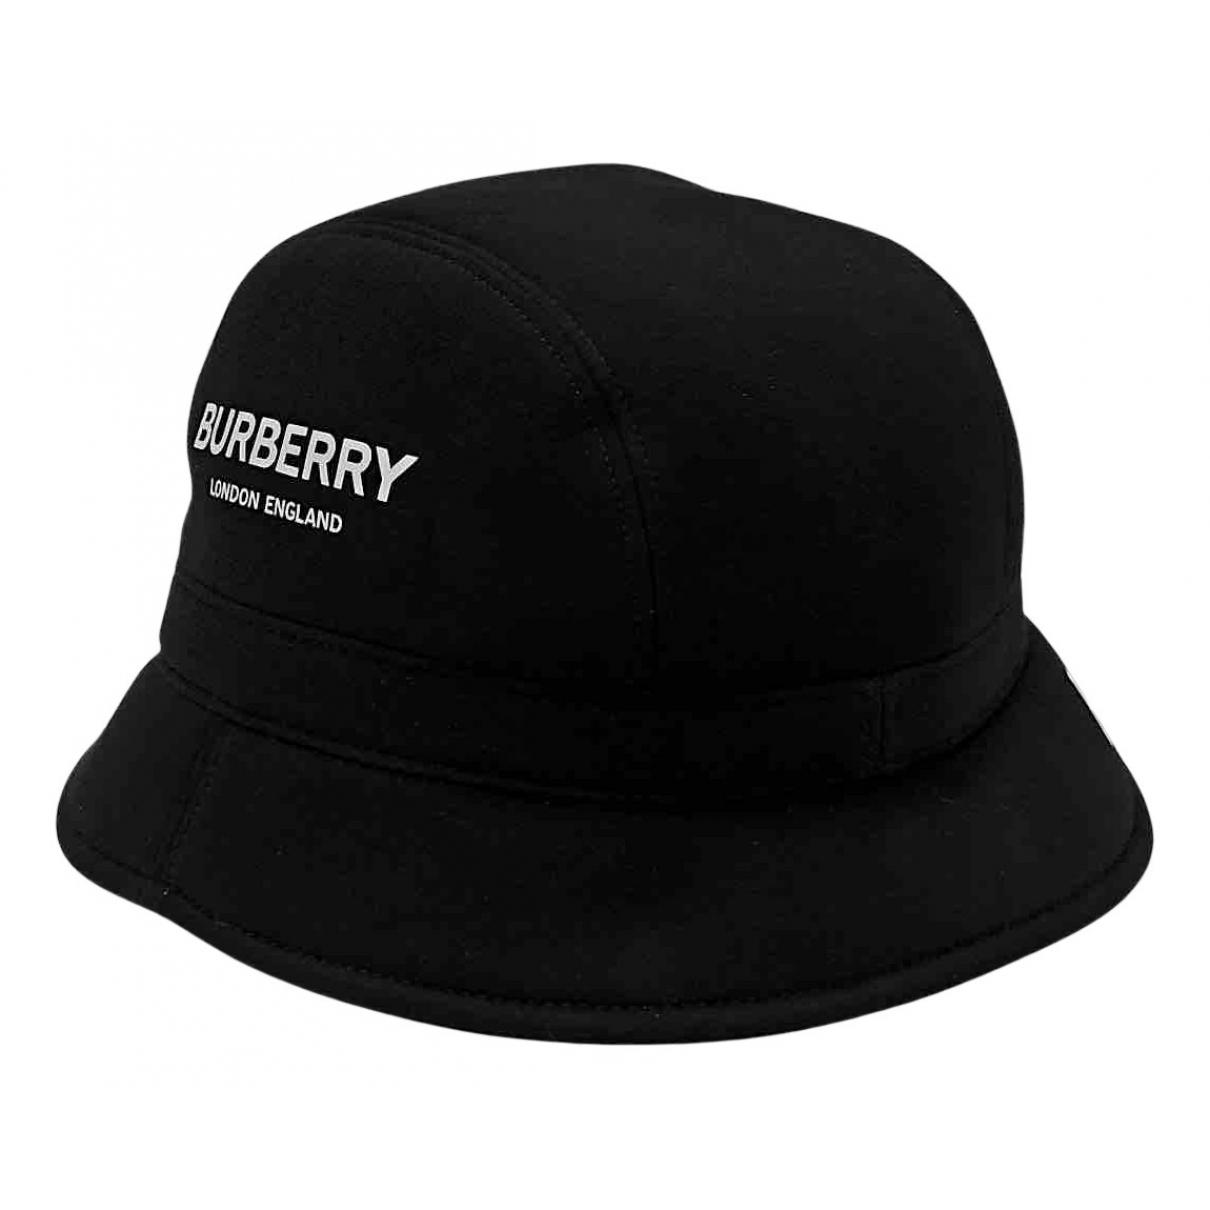 Burberry N Black Cotton hat & pull on hat for Men L International